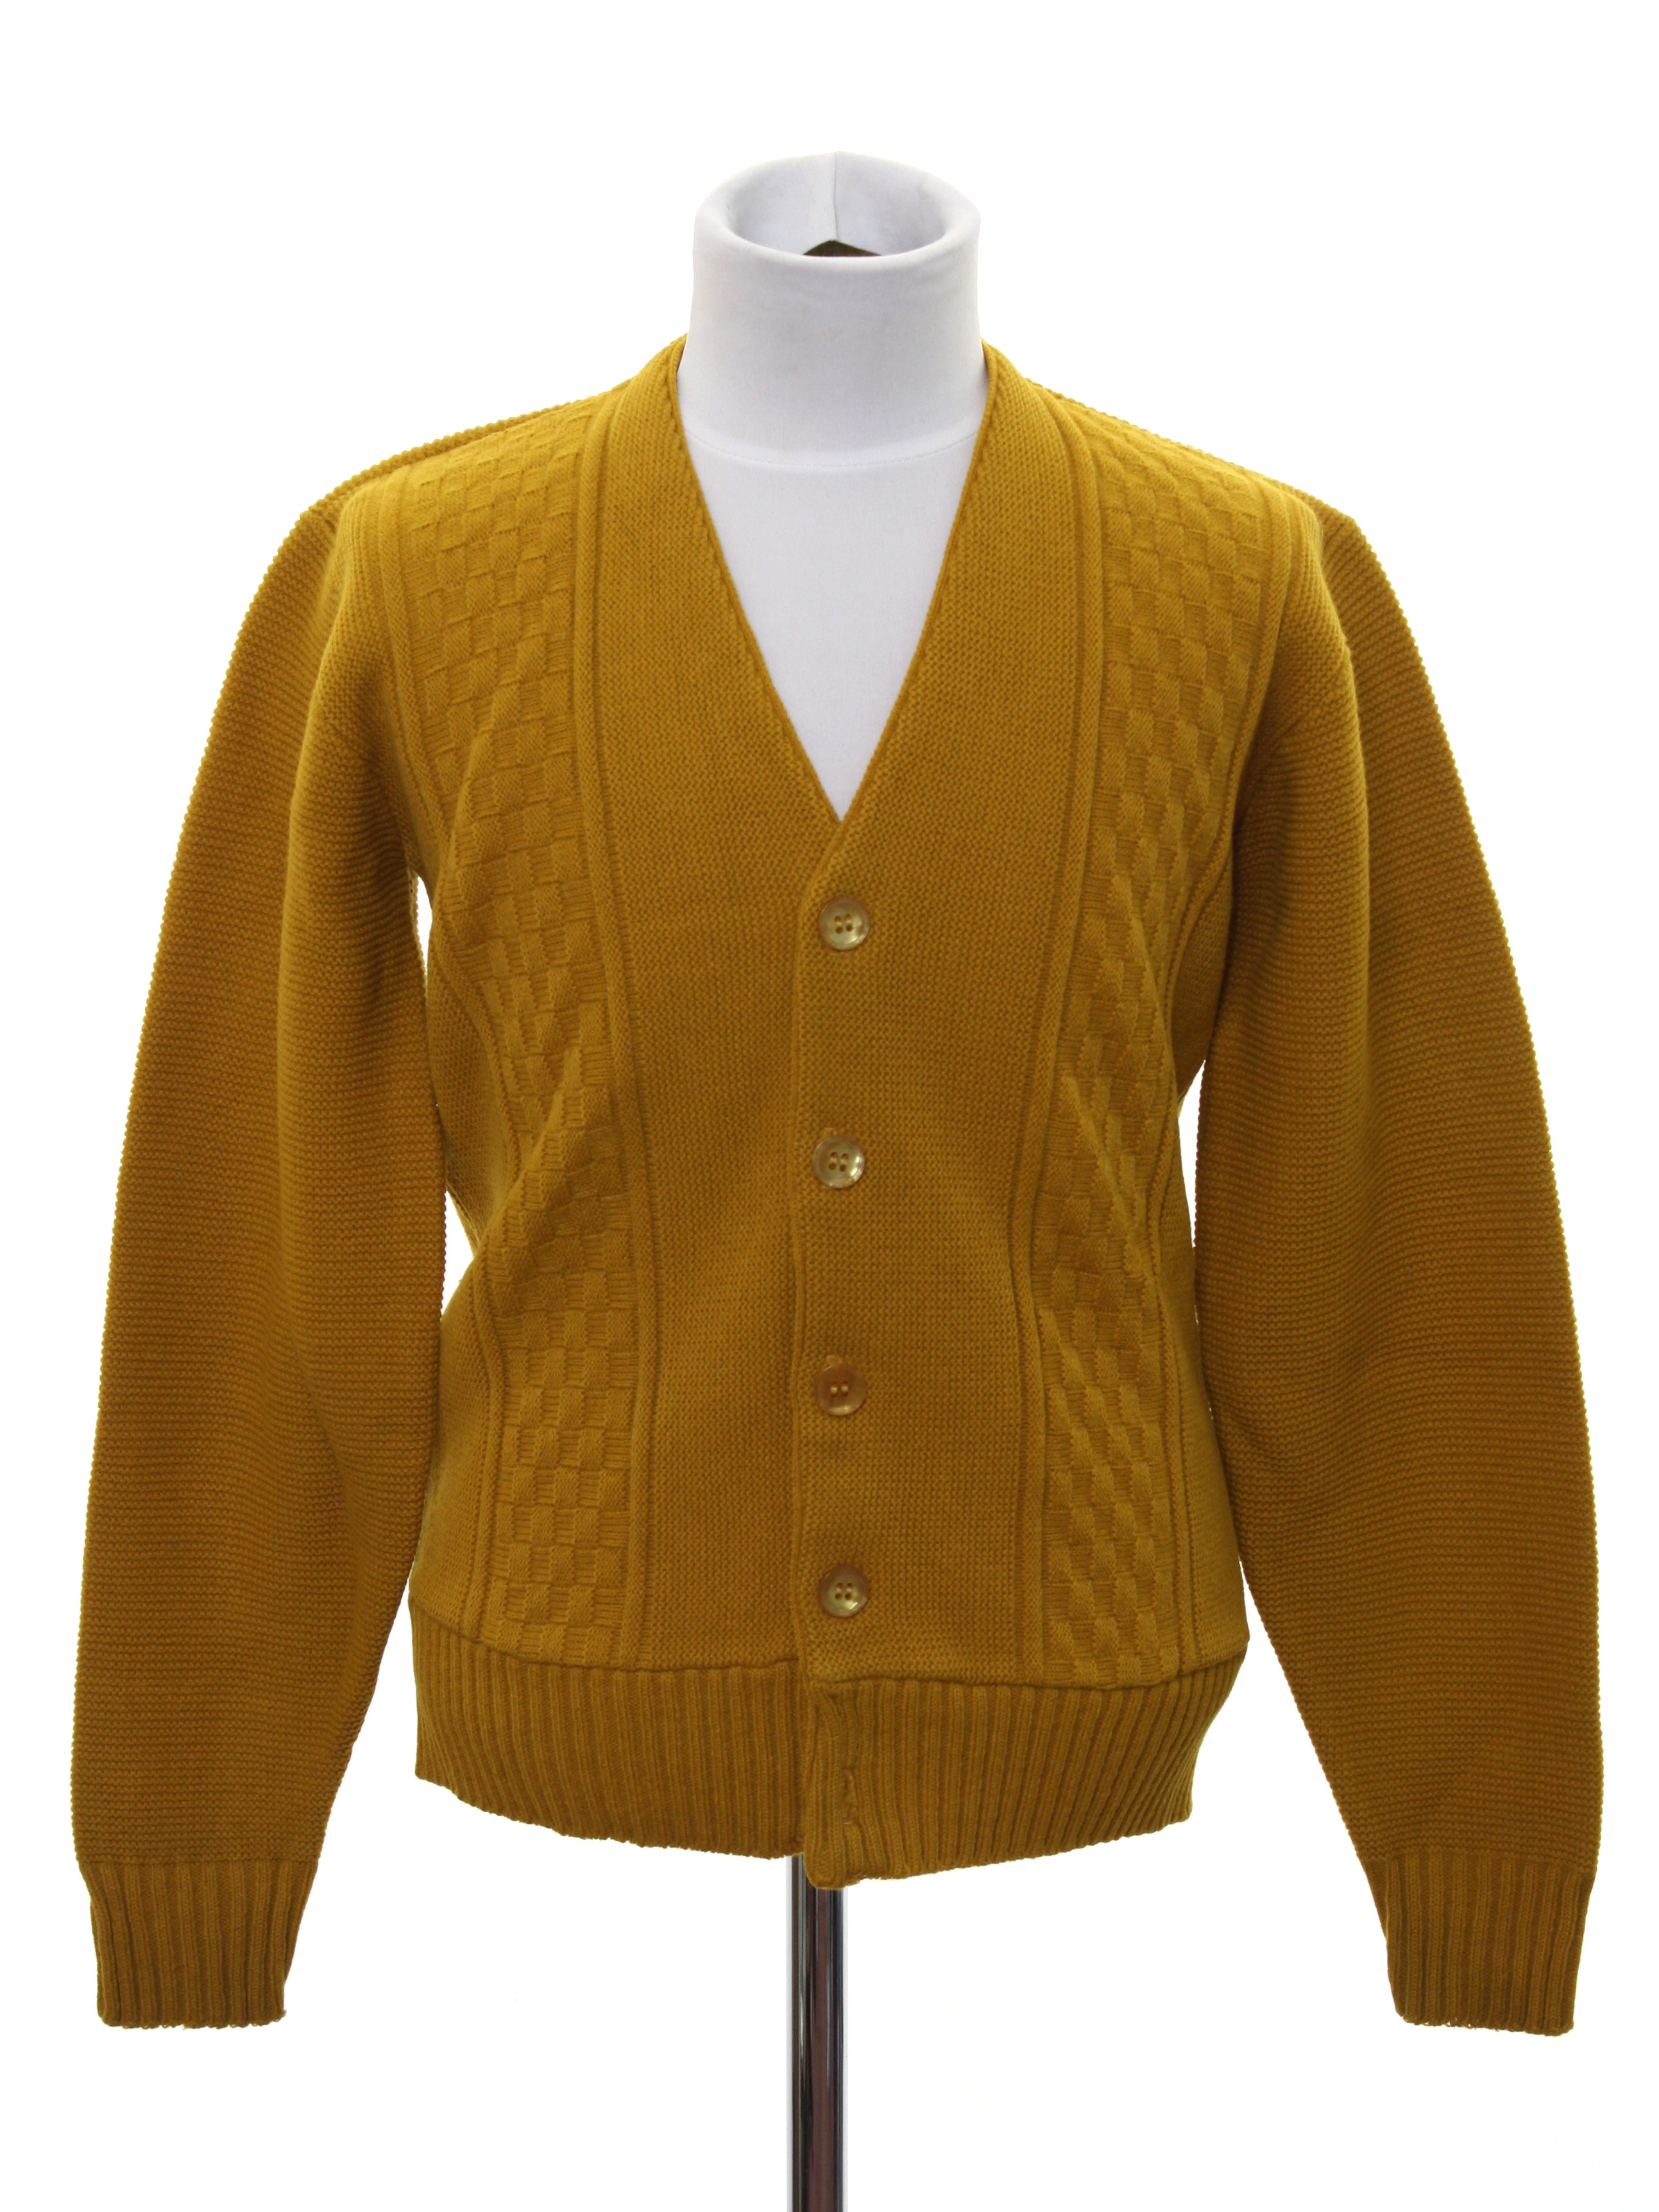 Retro 60s Caridgan Sweater 60s Missing Label Boys Mustard Yellow